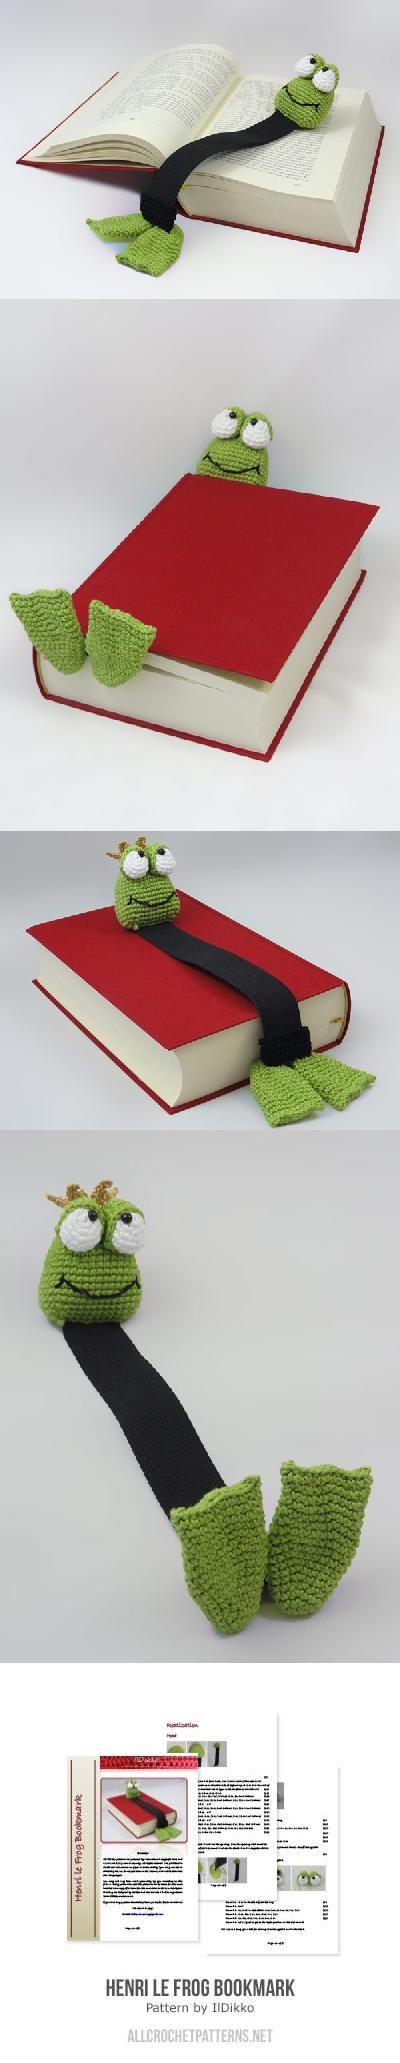 Henri le frog bookmark crochet pattern by IlDikko | Tejido ...